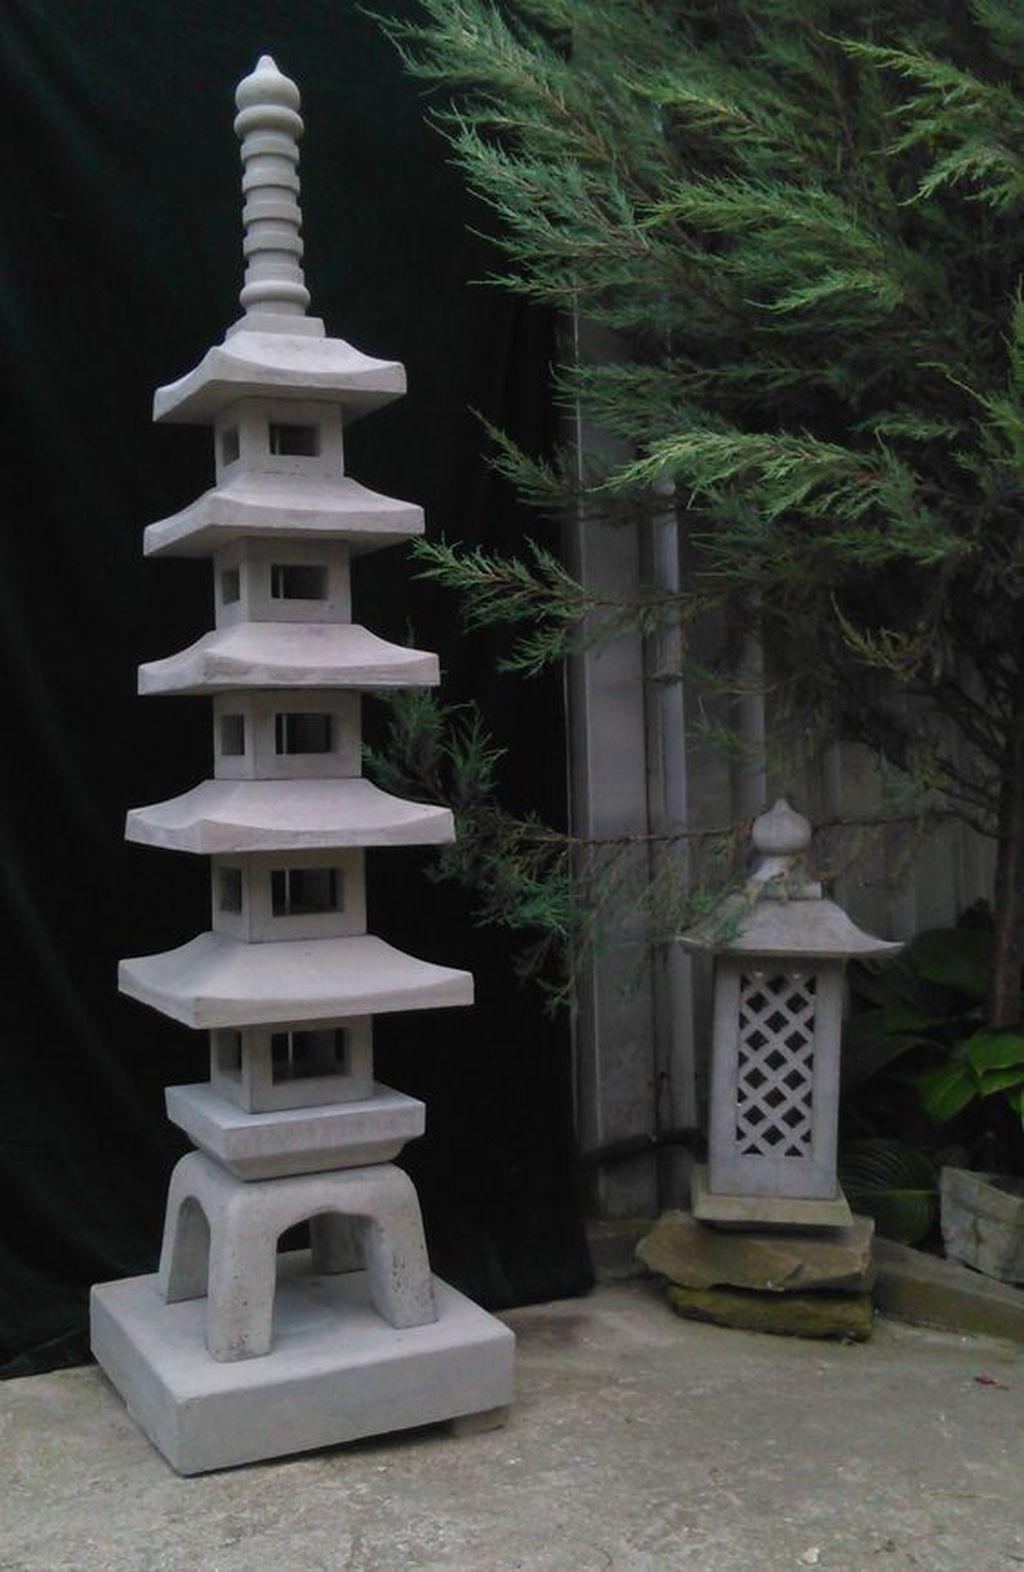 38 Awesome Diy Garden Lantern Ideas To Try Right Now Garden Lanterns Pagoda Garden Japanese Garden Lanterns